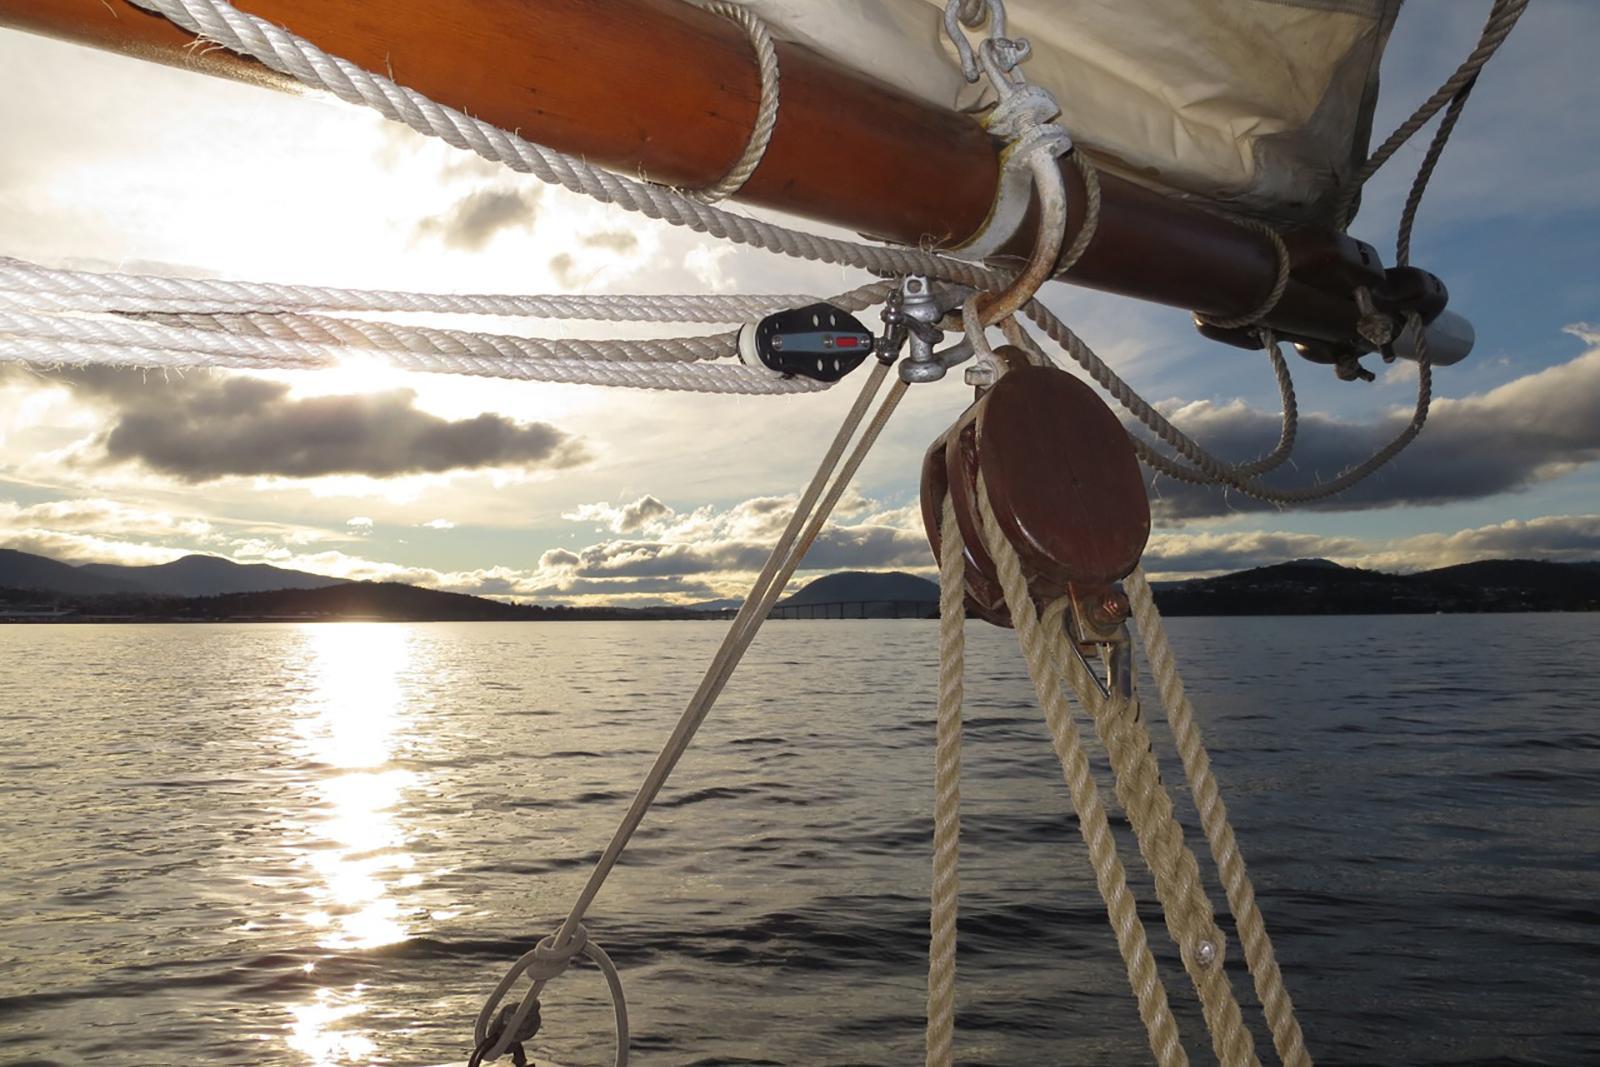 Sailing on the Derwent River Hobart Tasmania